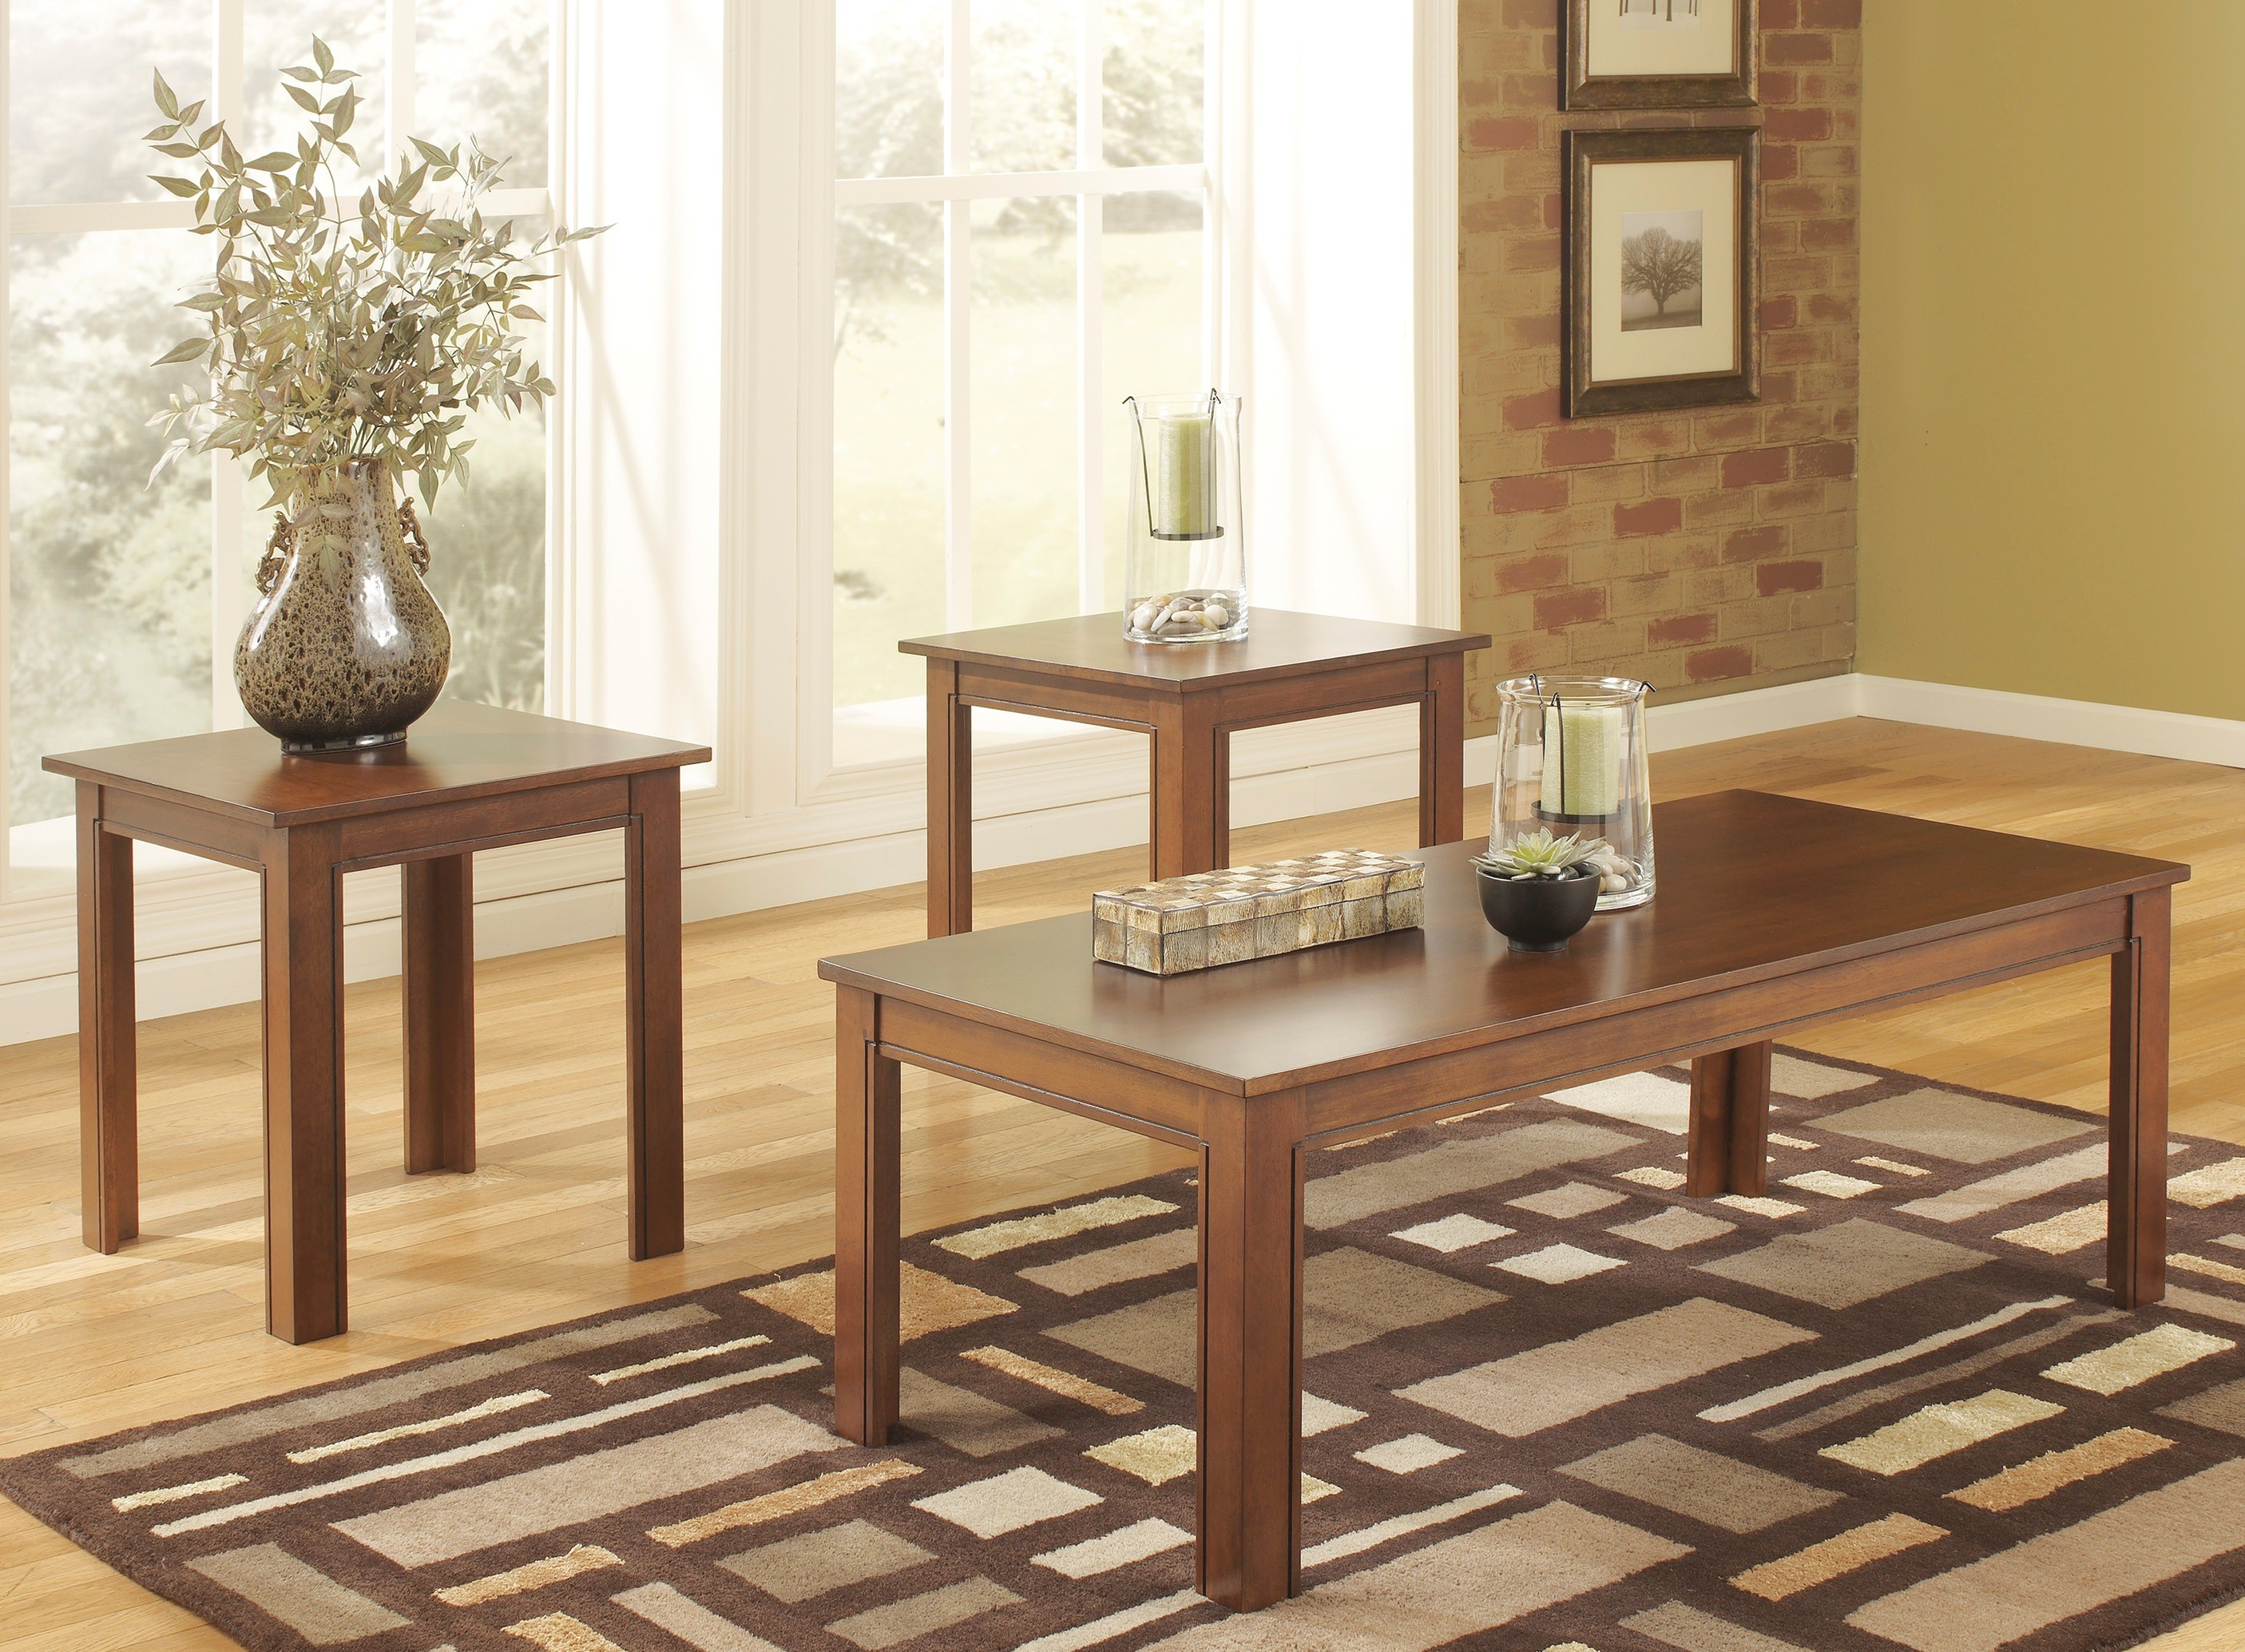 coffee tables ideas ashley furniture and end piece yoshi international standard decoration premium stunning shocking flower blossom storage cabinet outdoor accent homesense hours